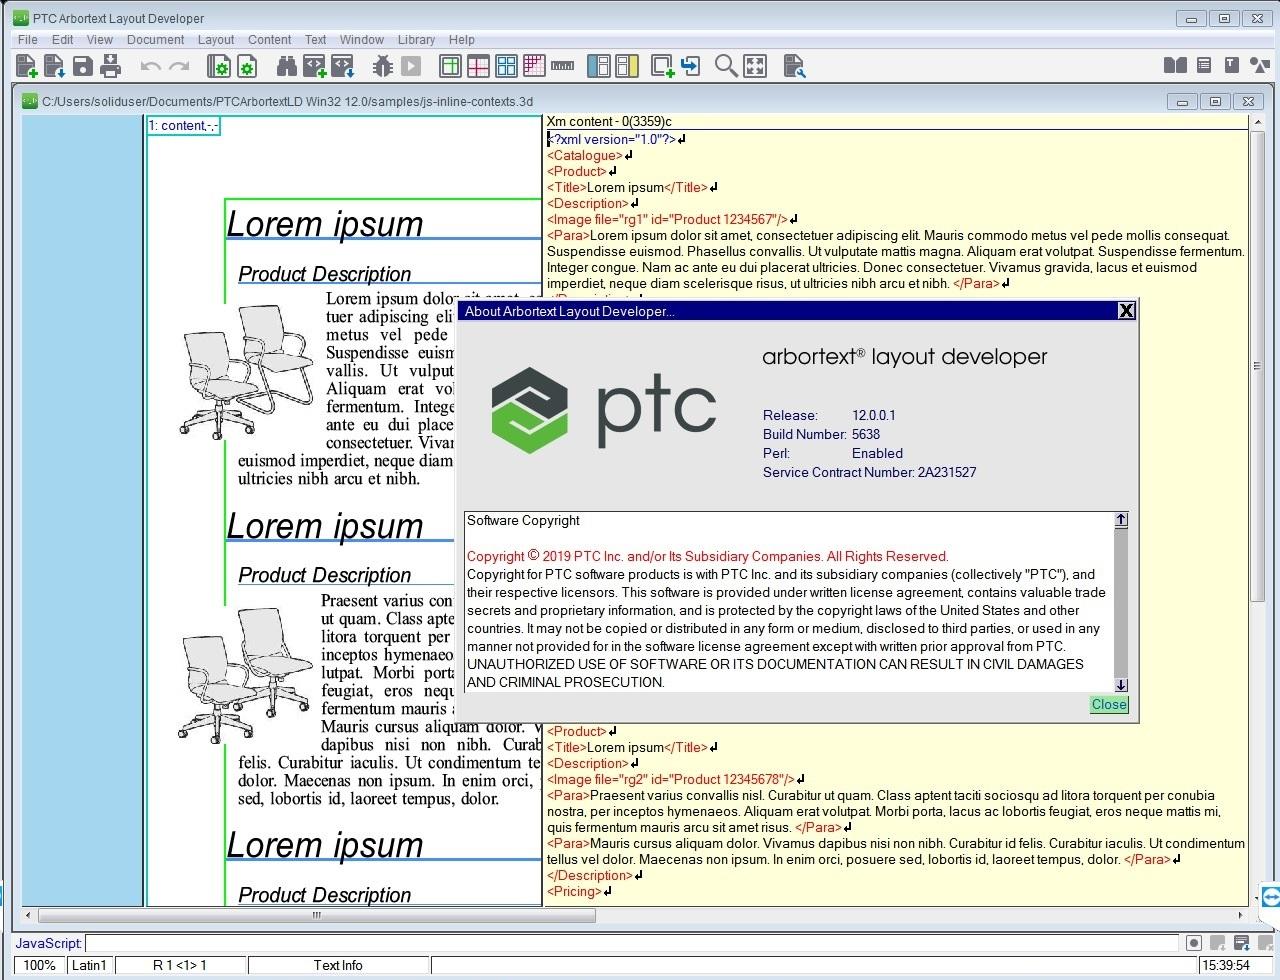 Working with PTC Arbortext Layout Developer 12.0.0.1 full license